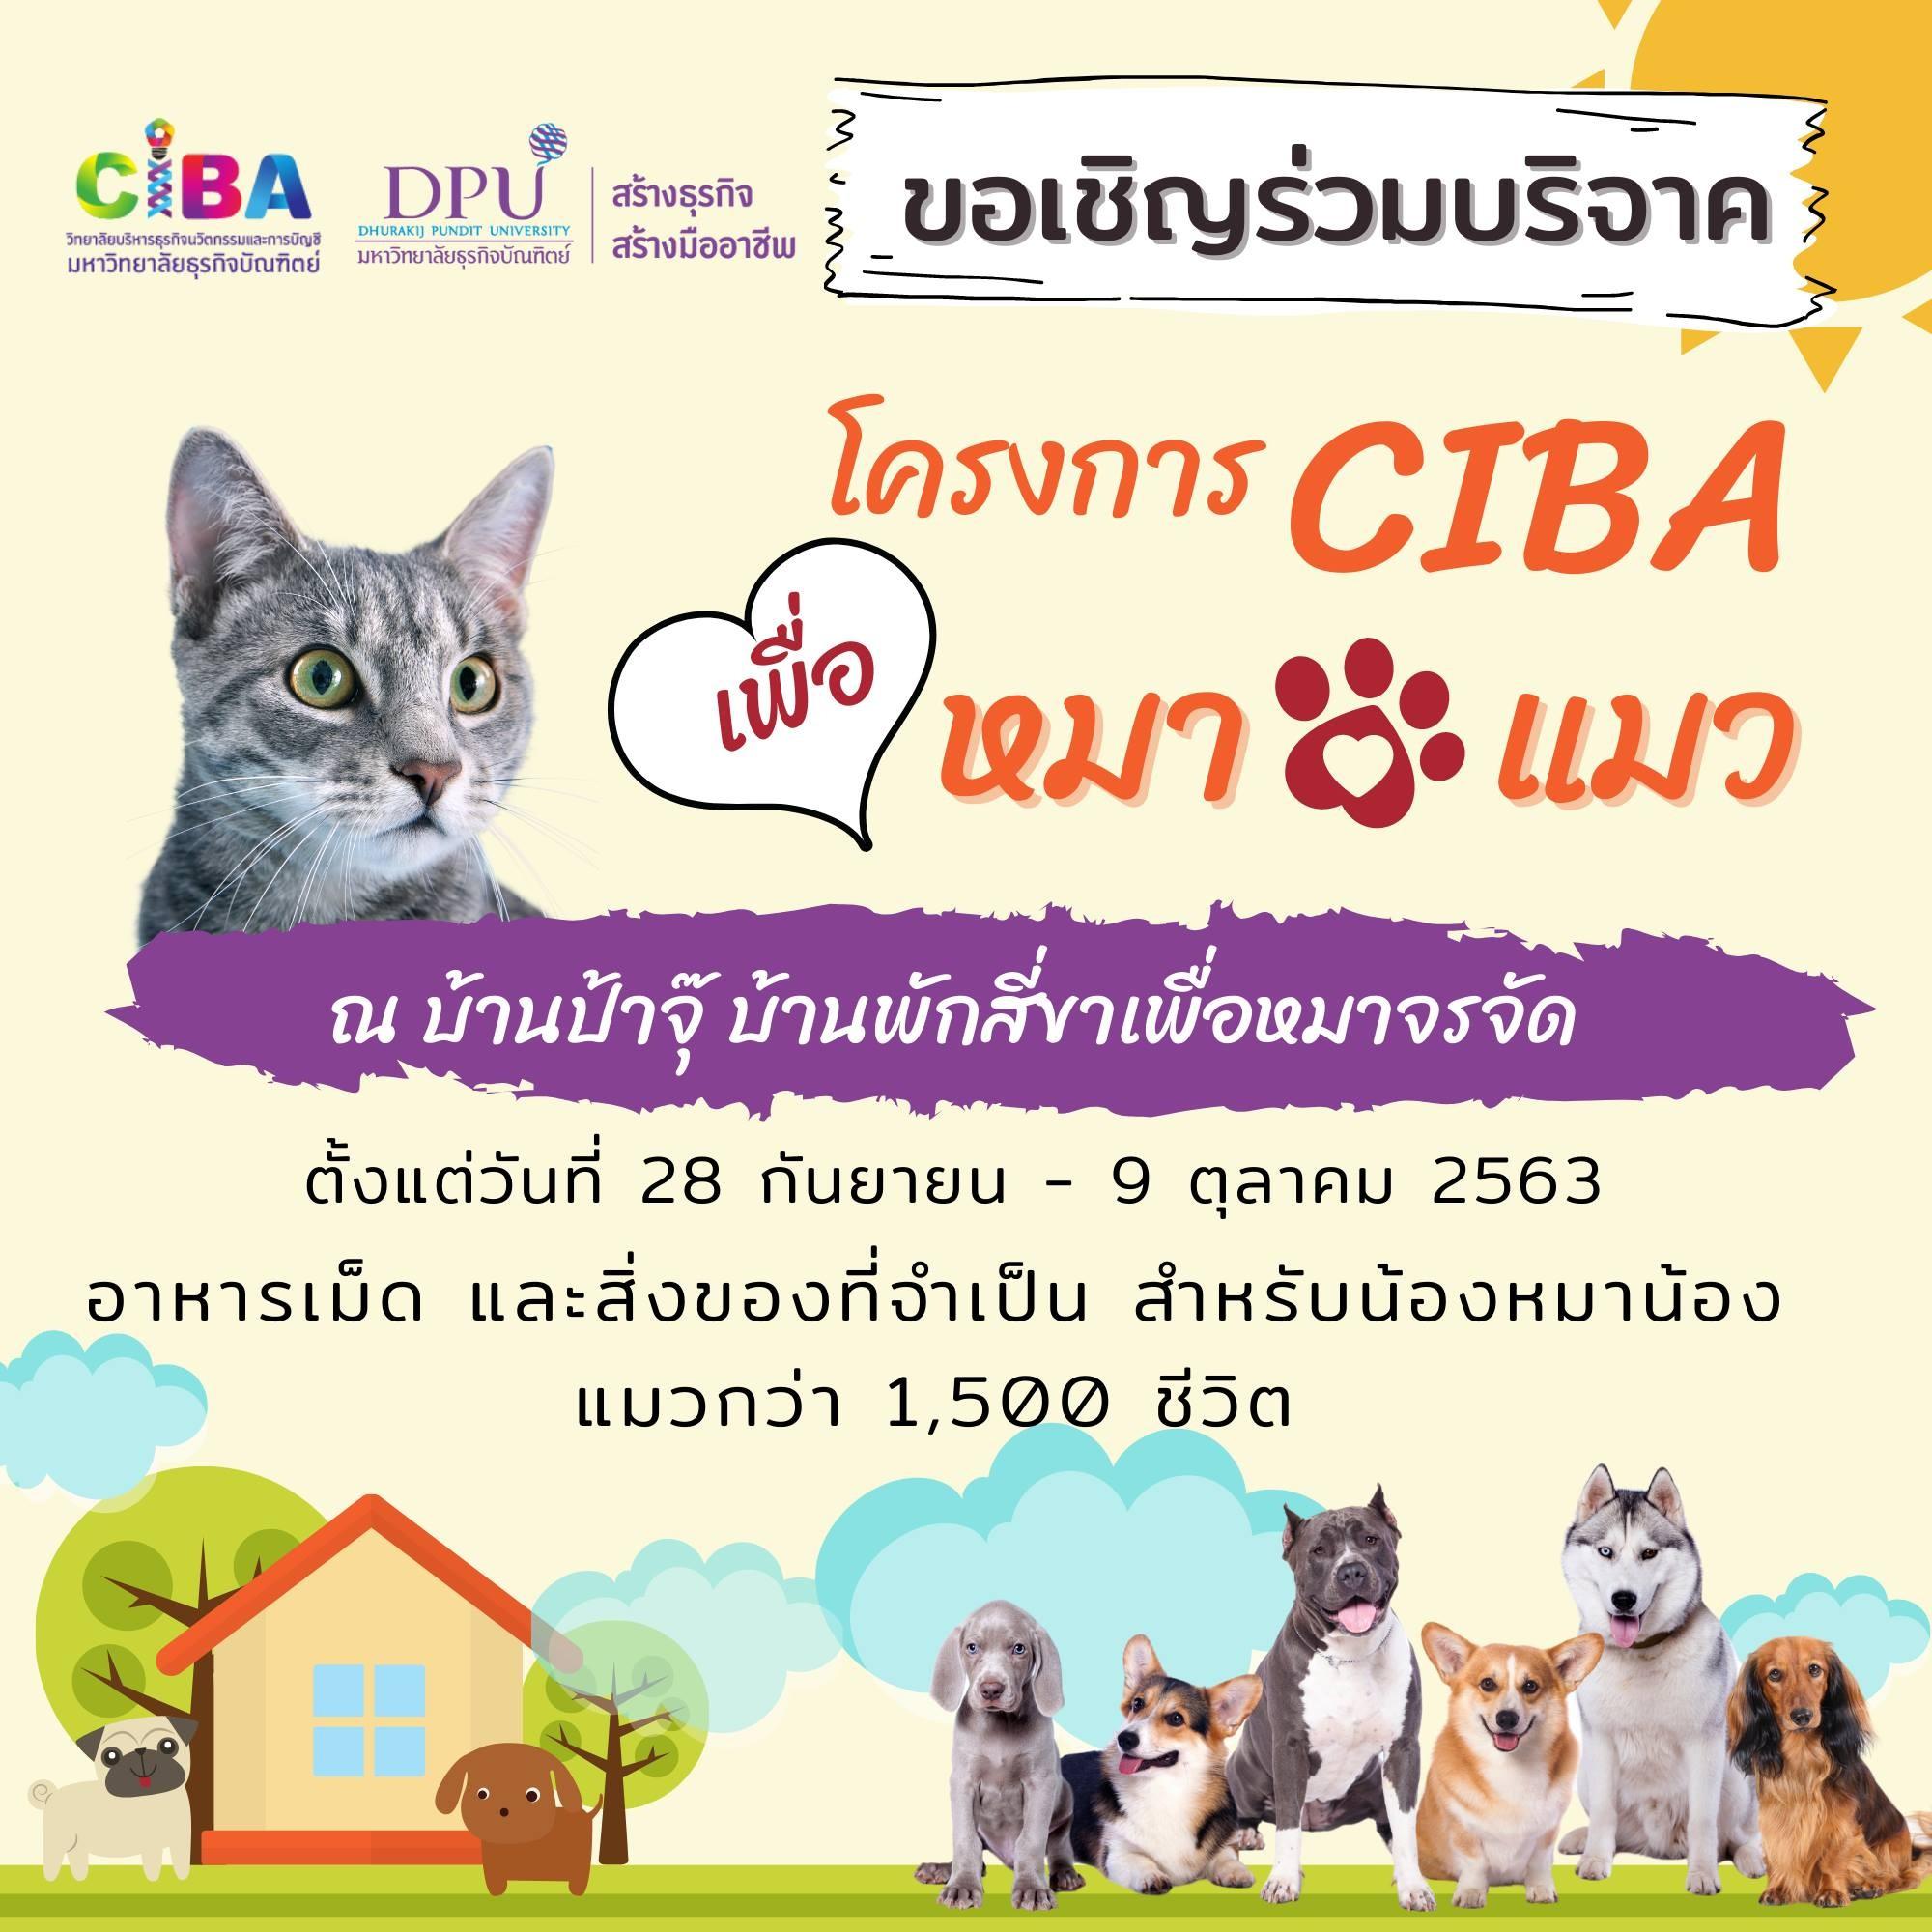 CIBA学院Tiger邀请您参与爱心捐助